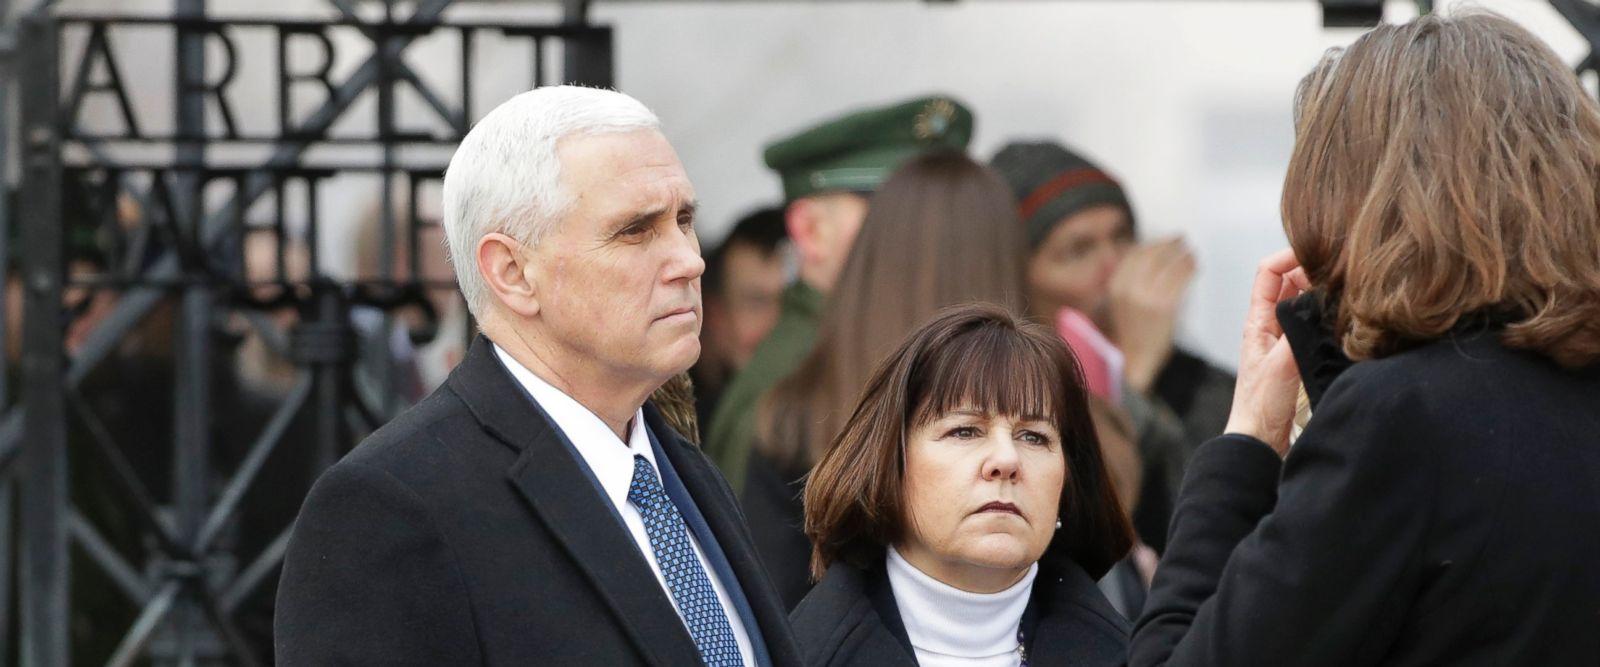 US Vice President Visits Former Nazi Concentration Camp